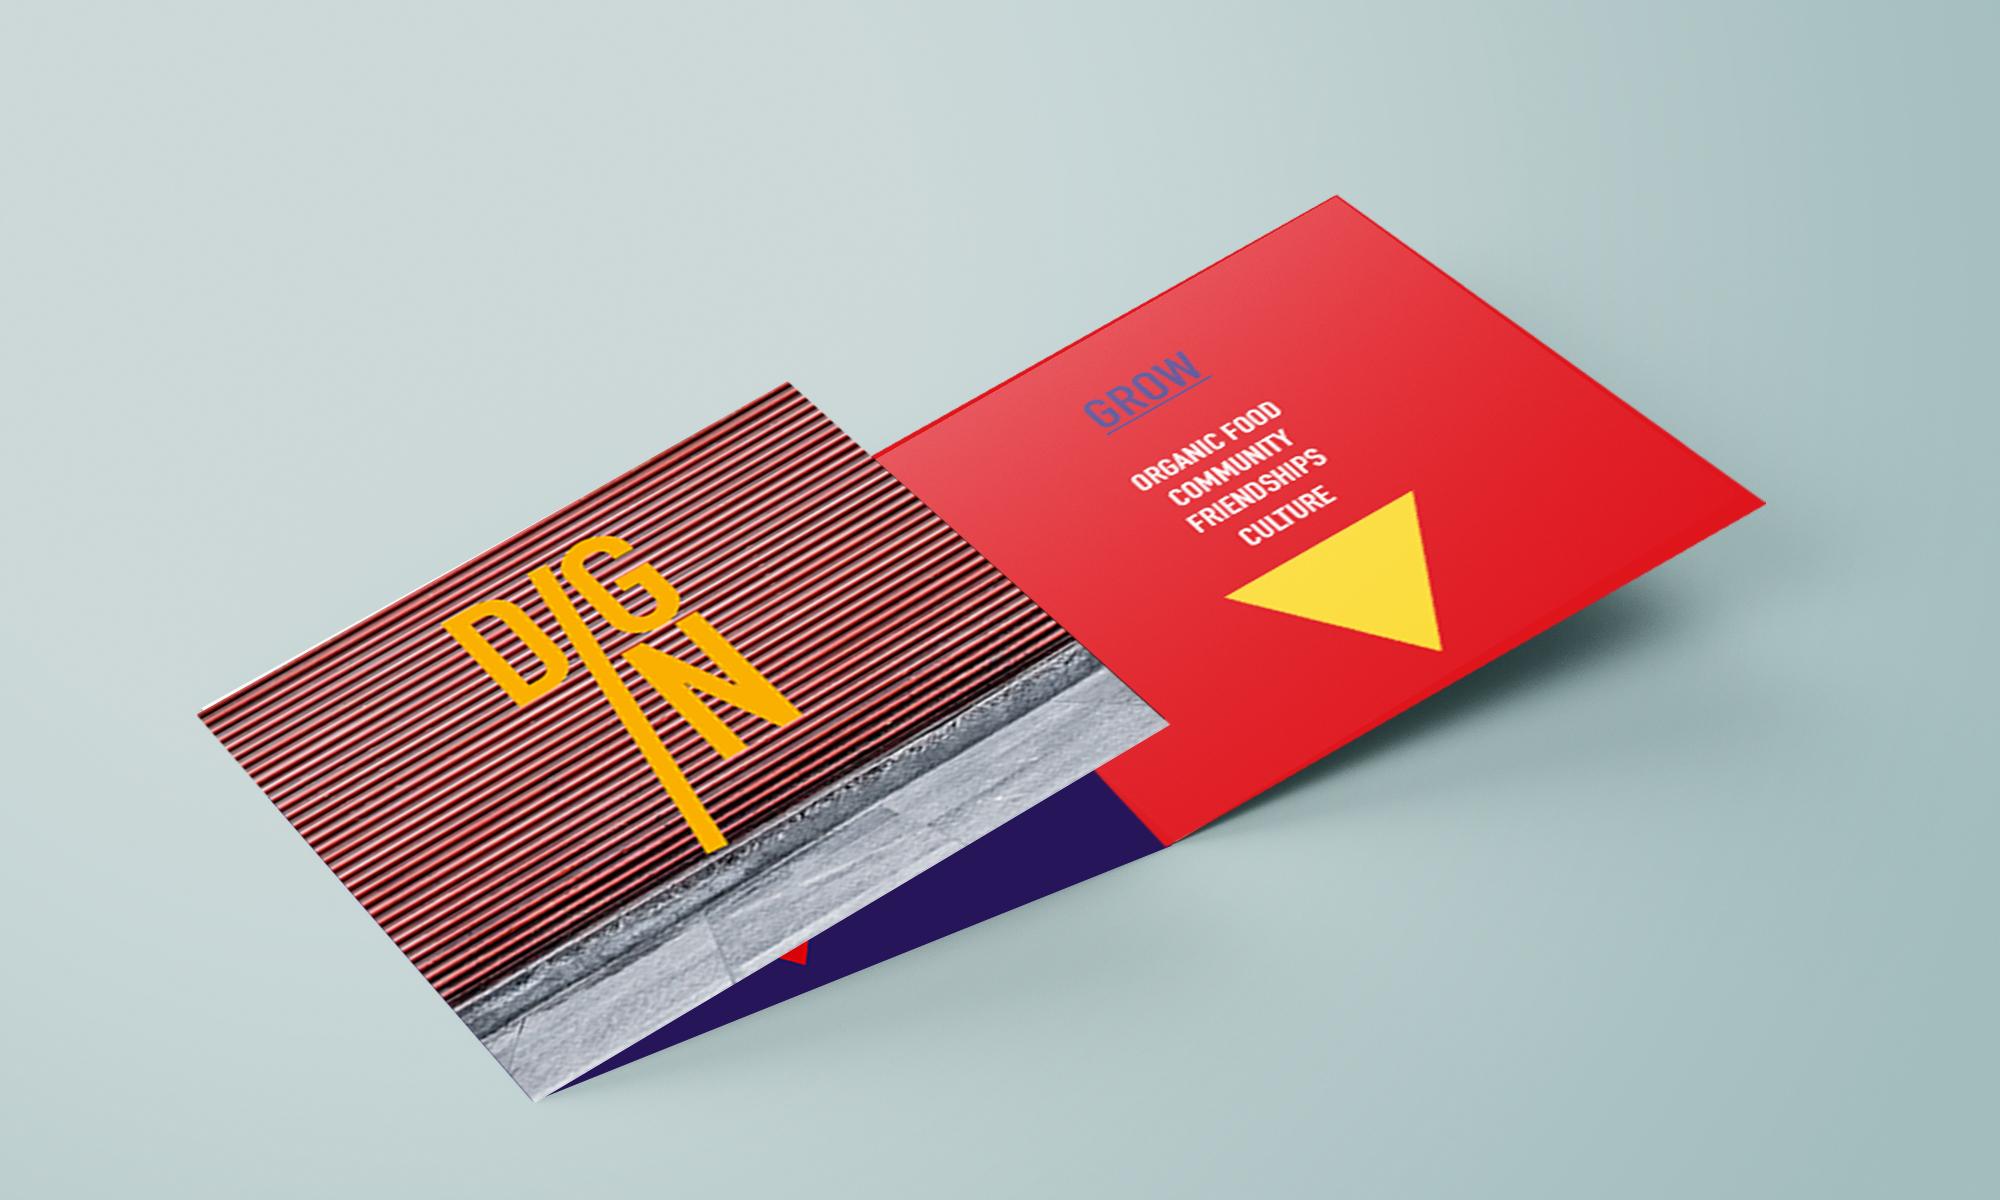 DigIn_fold out flyer.jpg